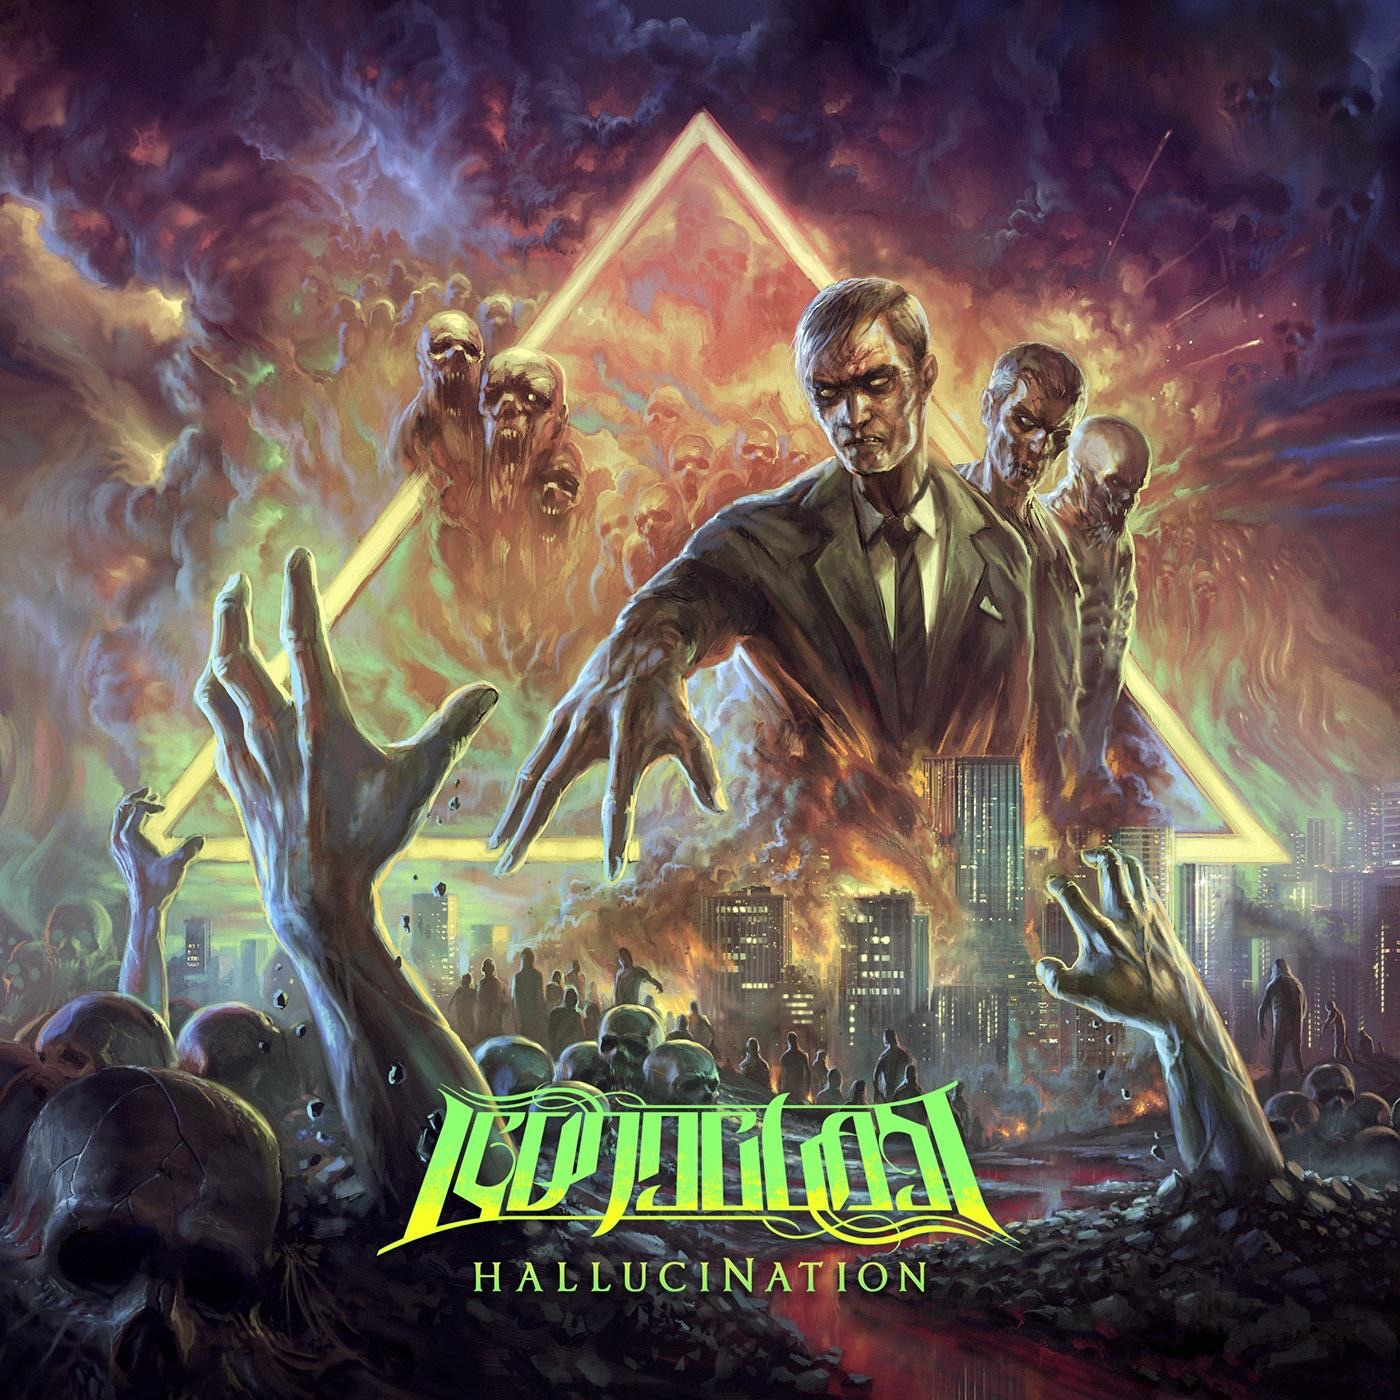 Iconoclast - halluciNation (2016)